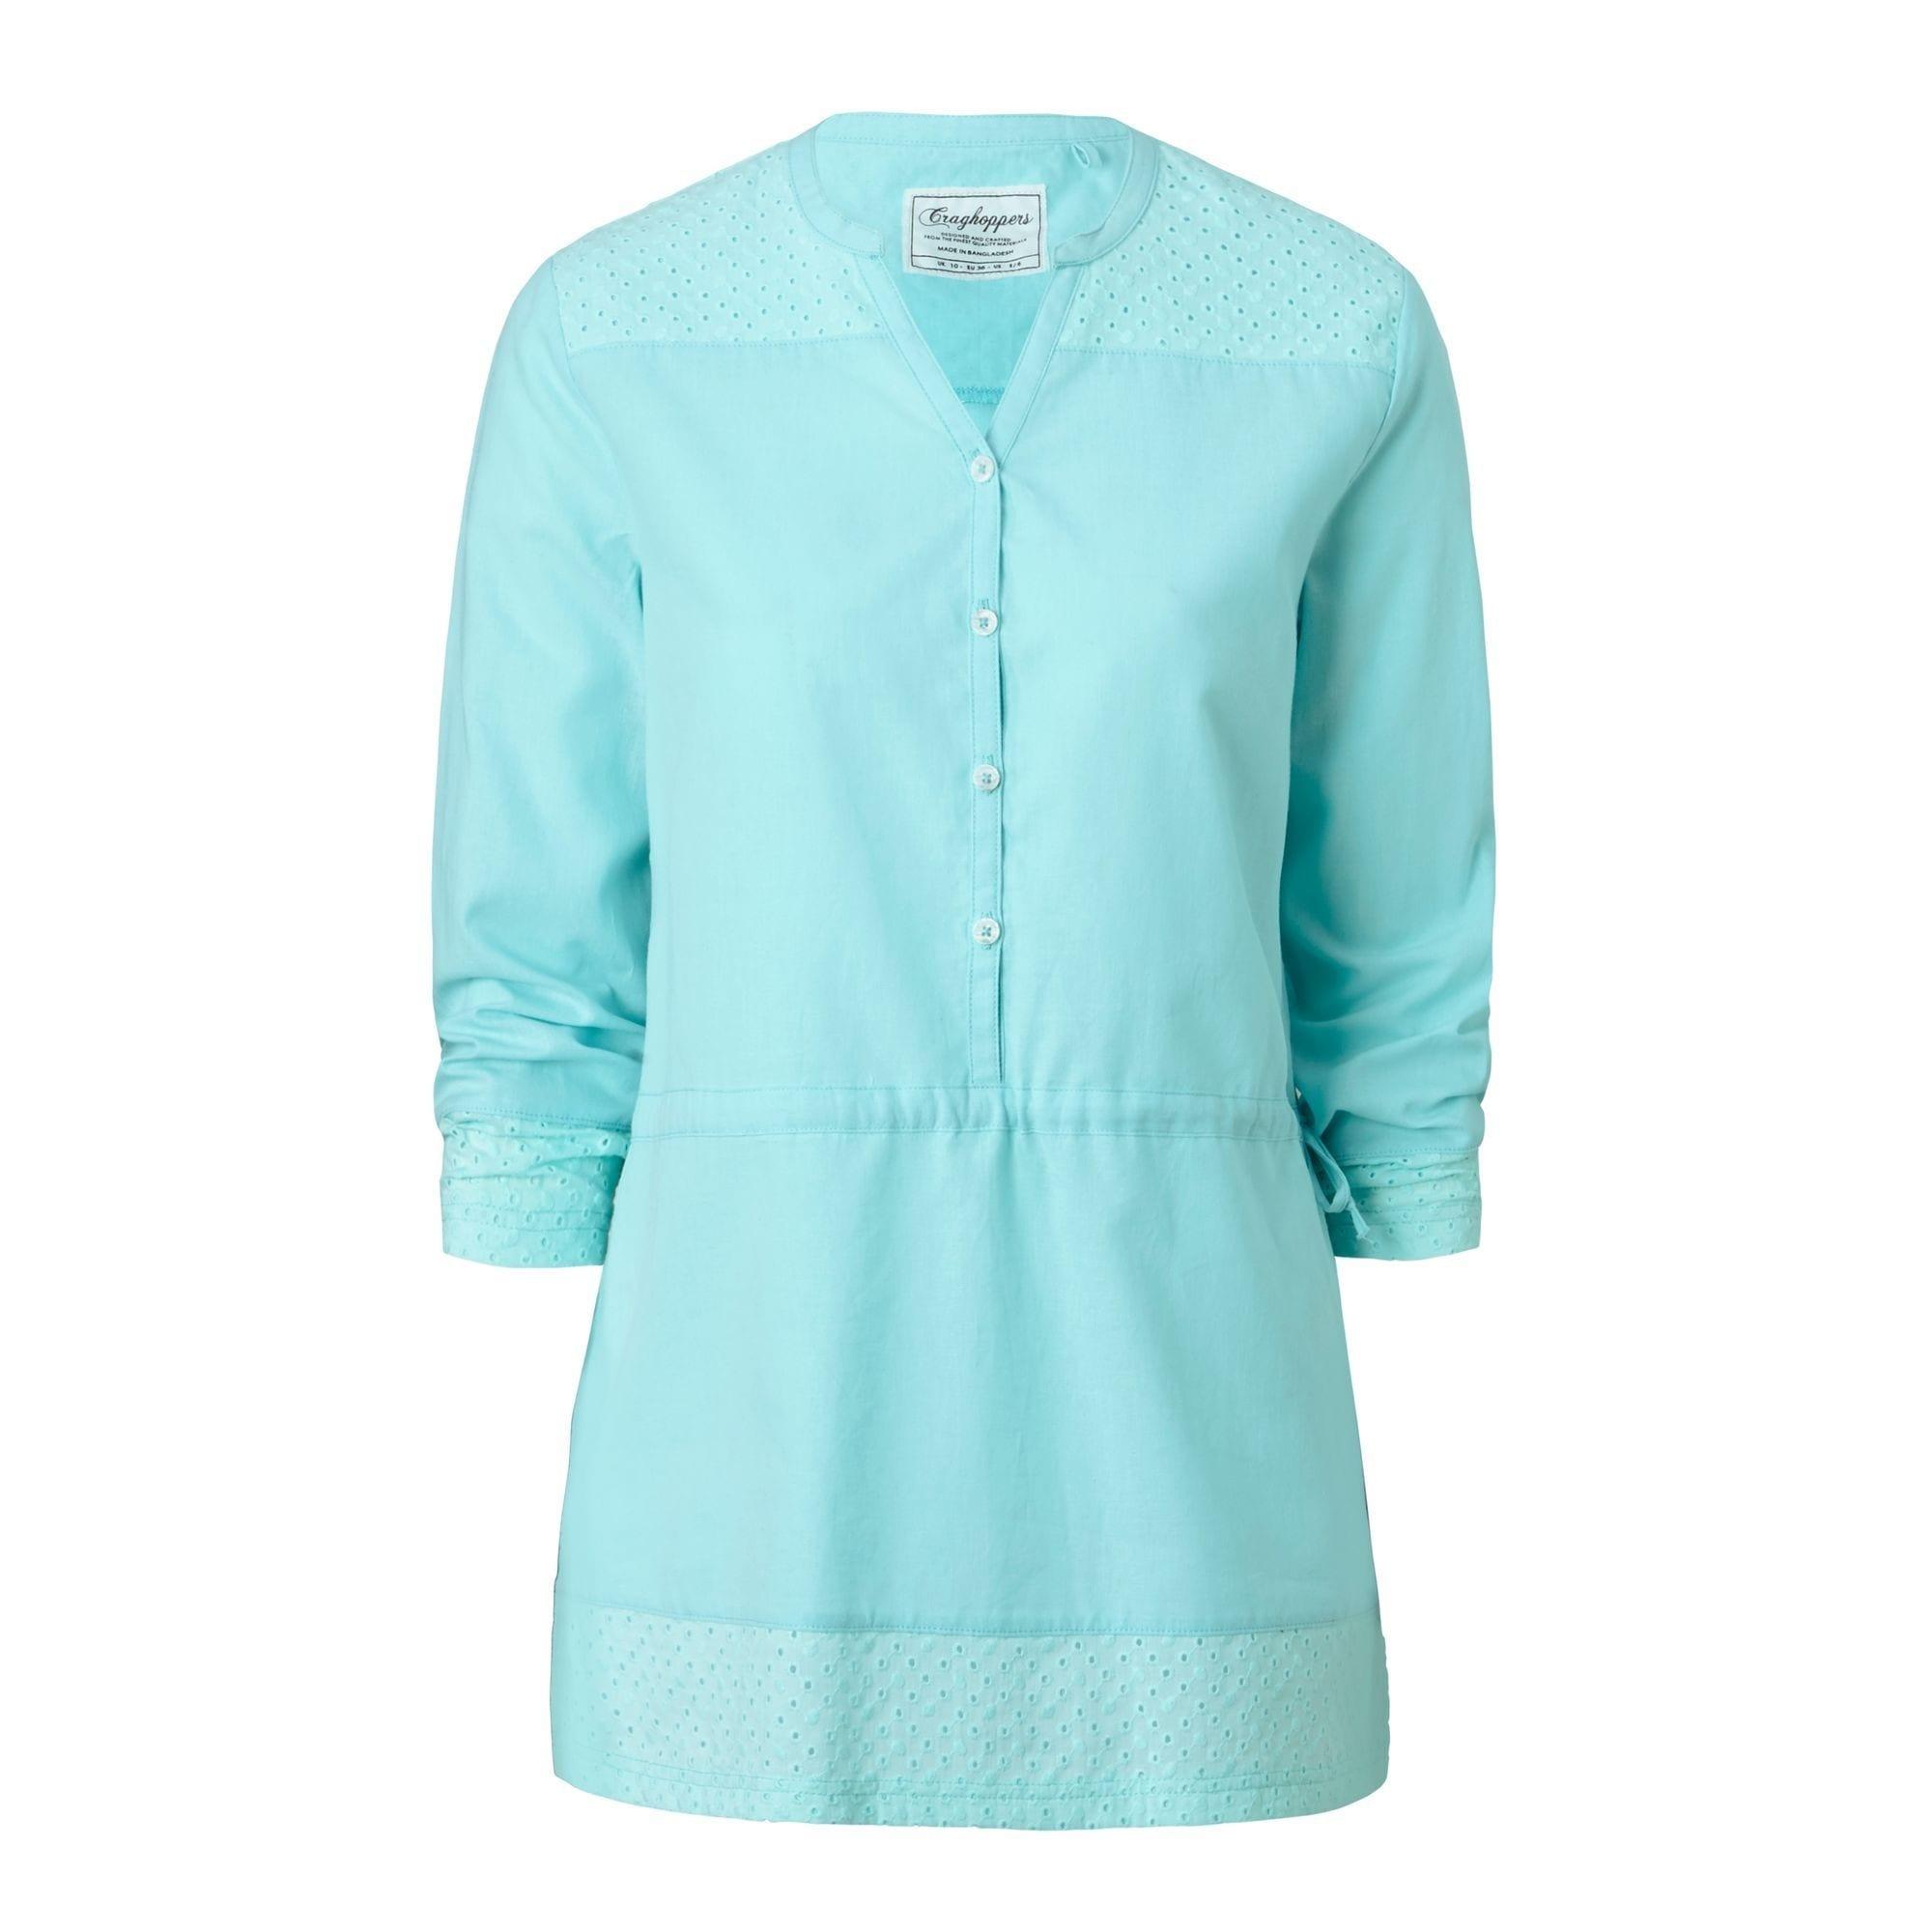 Craghoppers Tunikashirt Damen Bluse Kadee langärmlig | Bekleidung > Shirts > Tunikashirts | Craghoppers